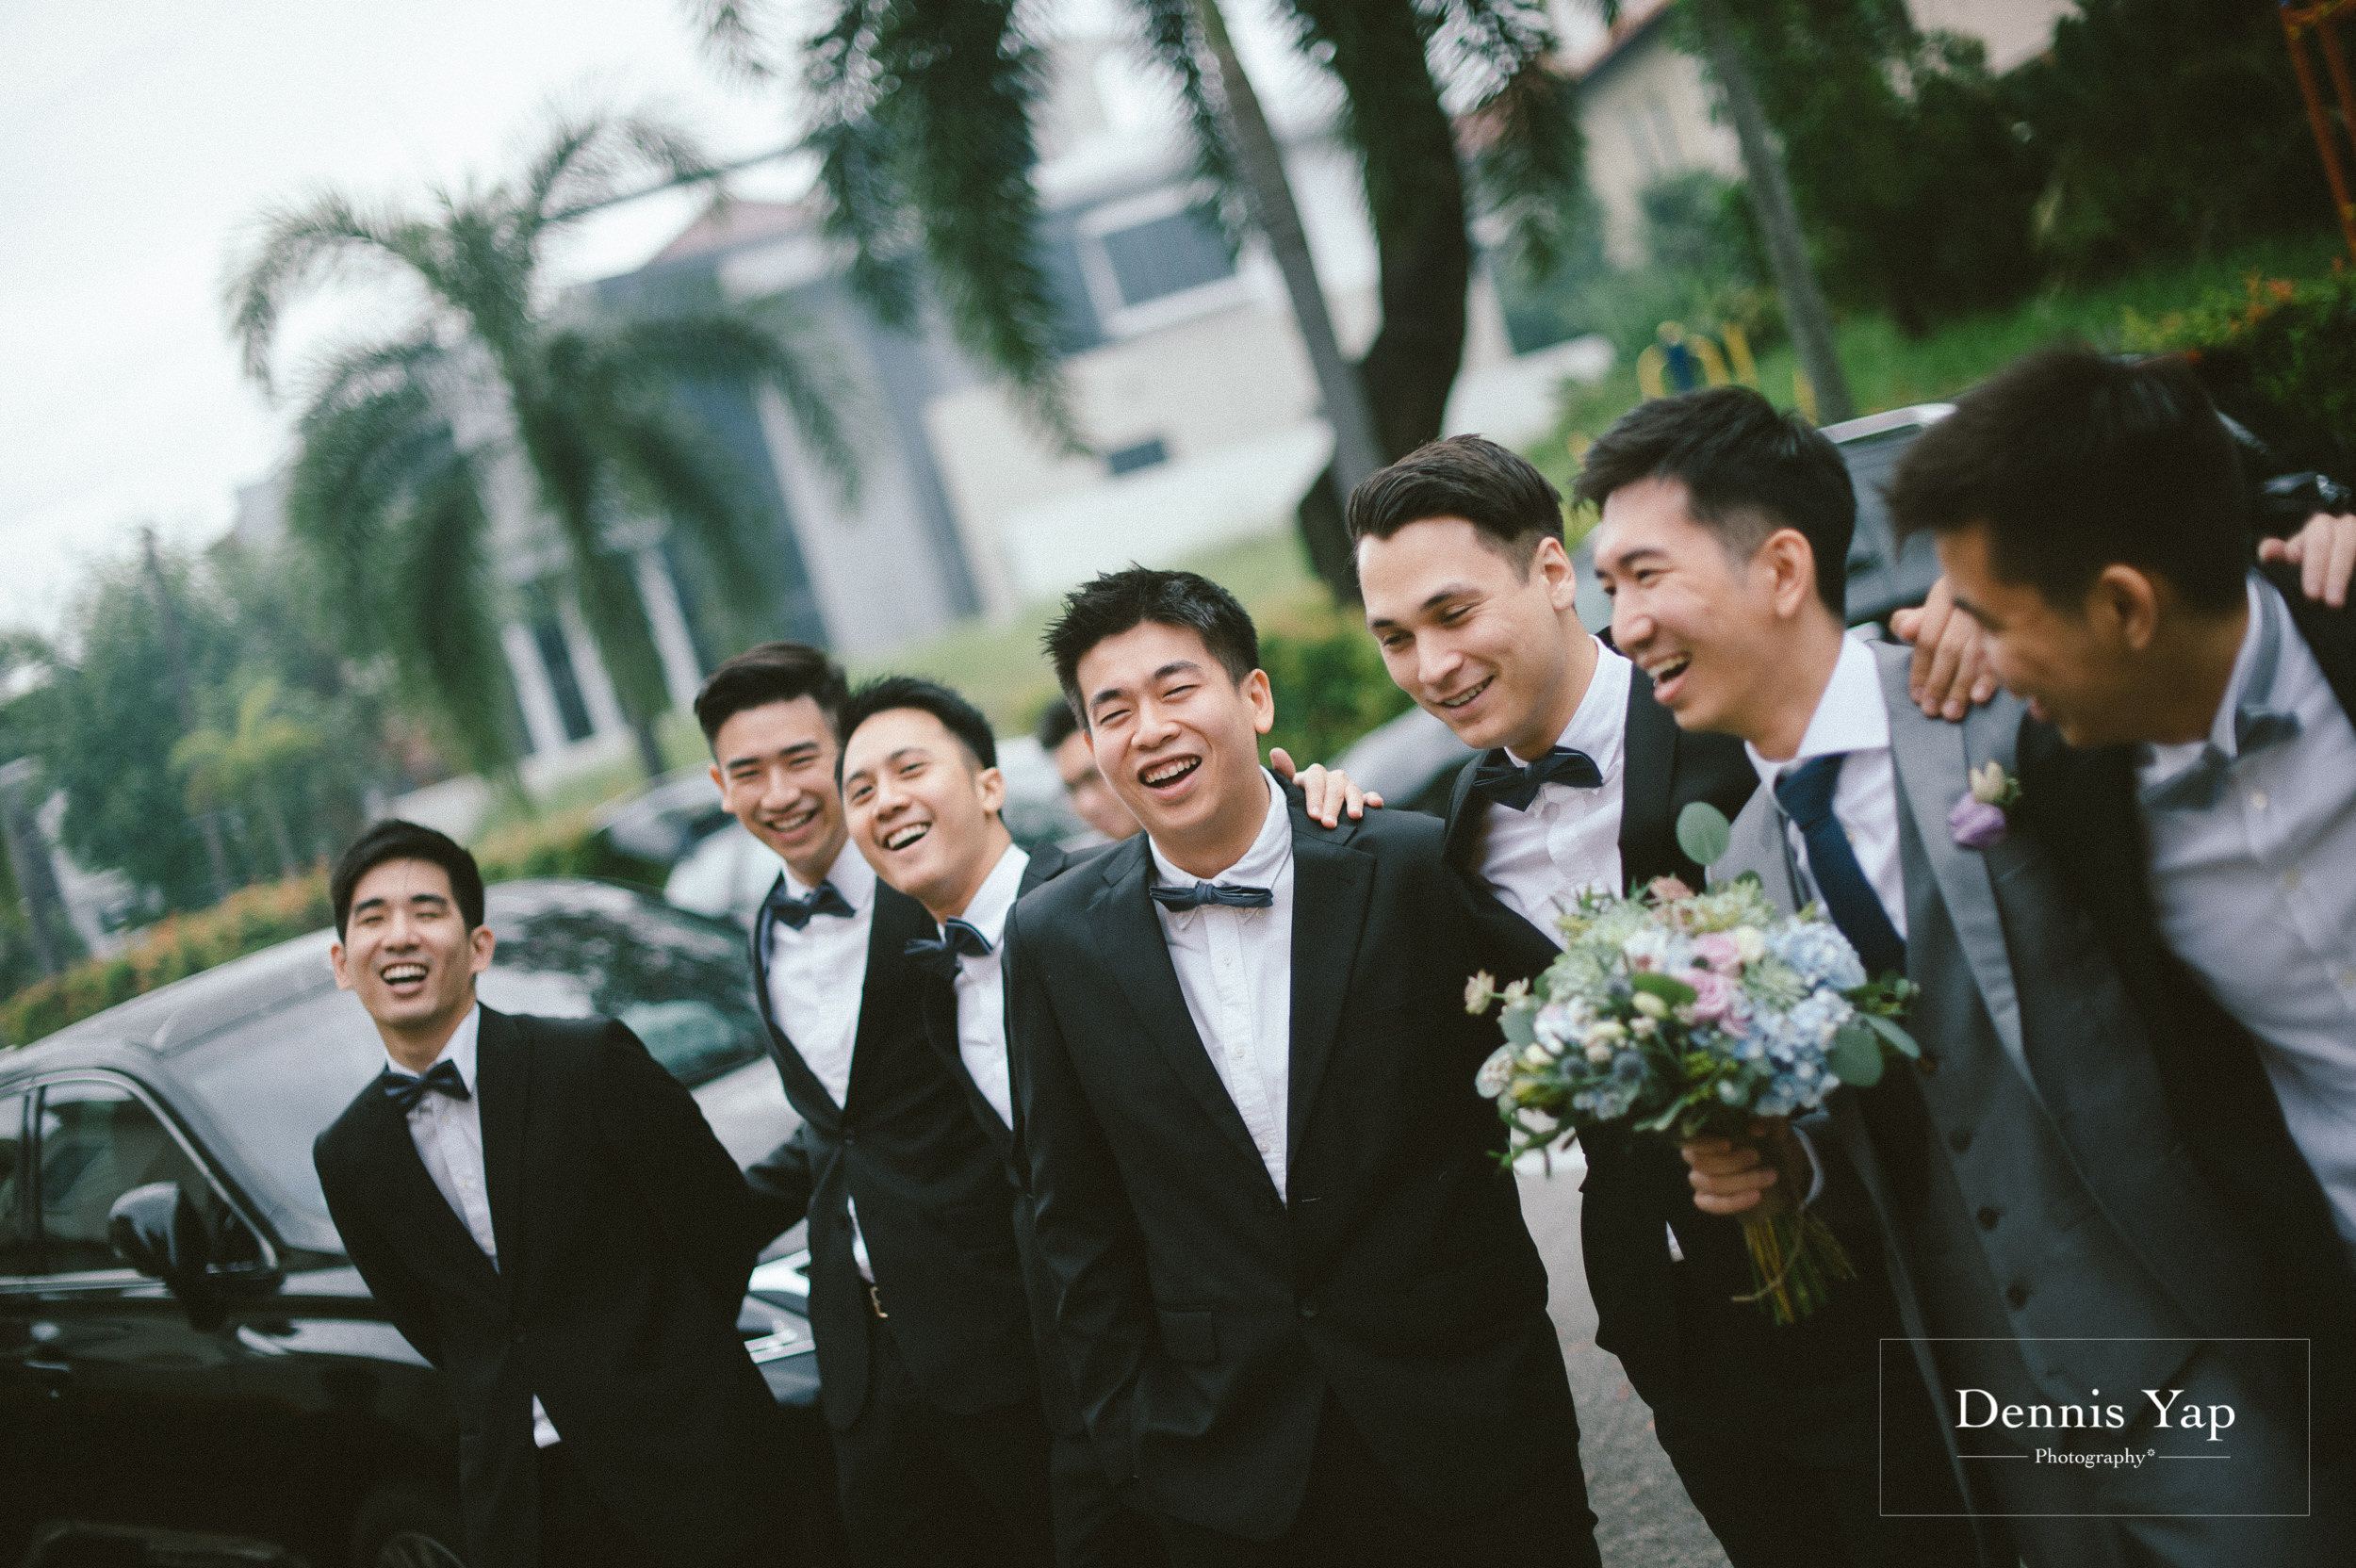 jamie hann wedding day gate crash garden wedding dennis yap photography traditional chinese tea ceremony-9.jpg